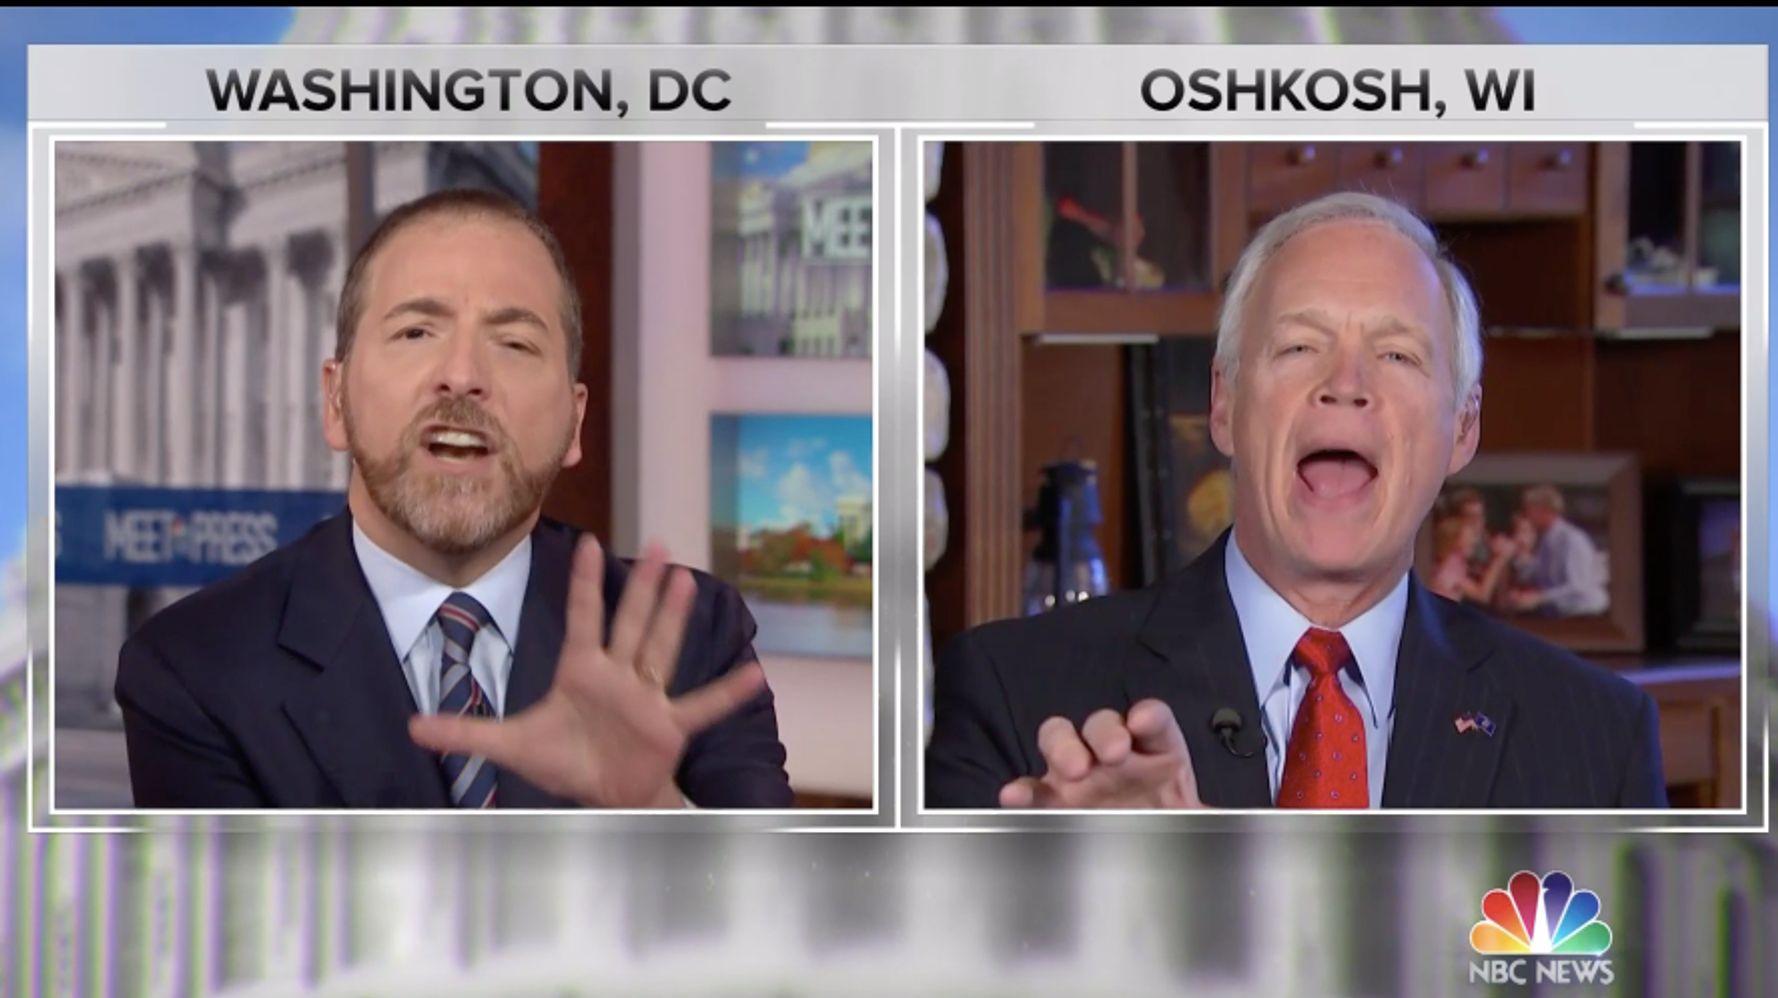 Westlake Legal Group 5d9a009b2100002504323820 NBC's Chuck Todd Slams Sen. Ron Johnson For Pushing Fox News 'Propaganda'